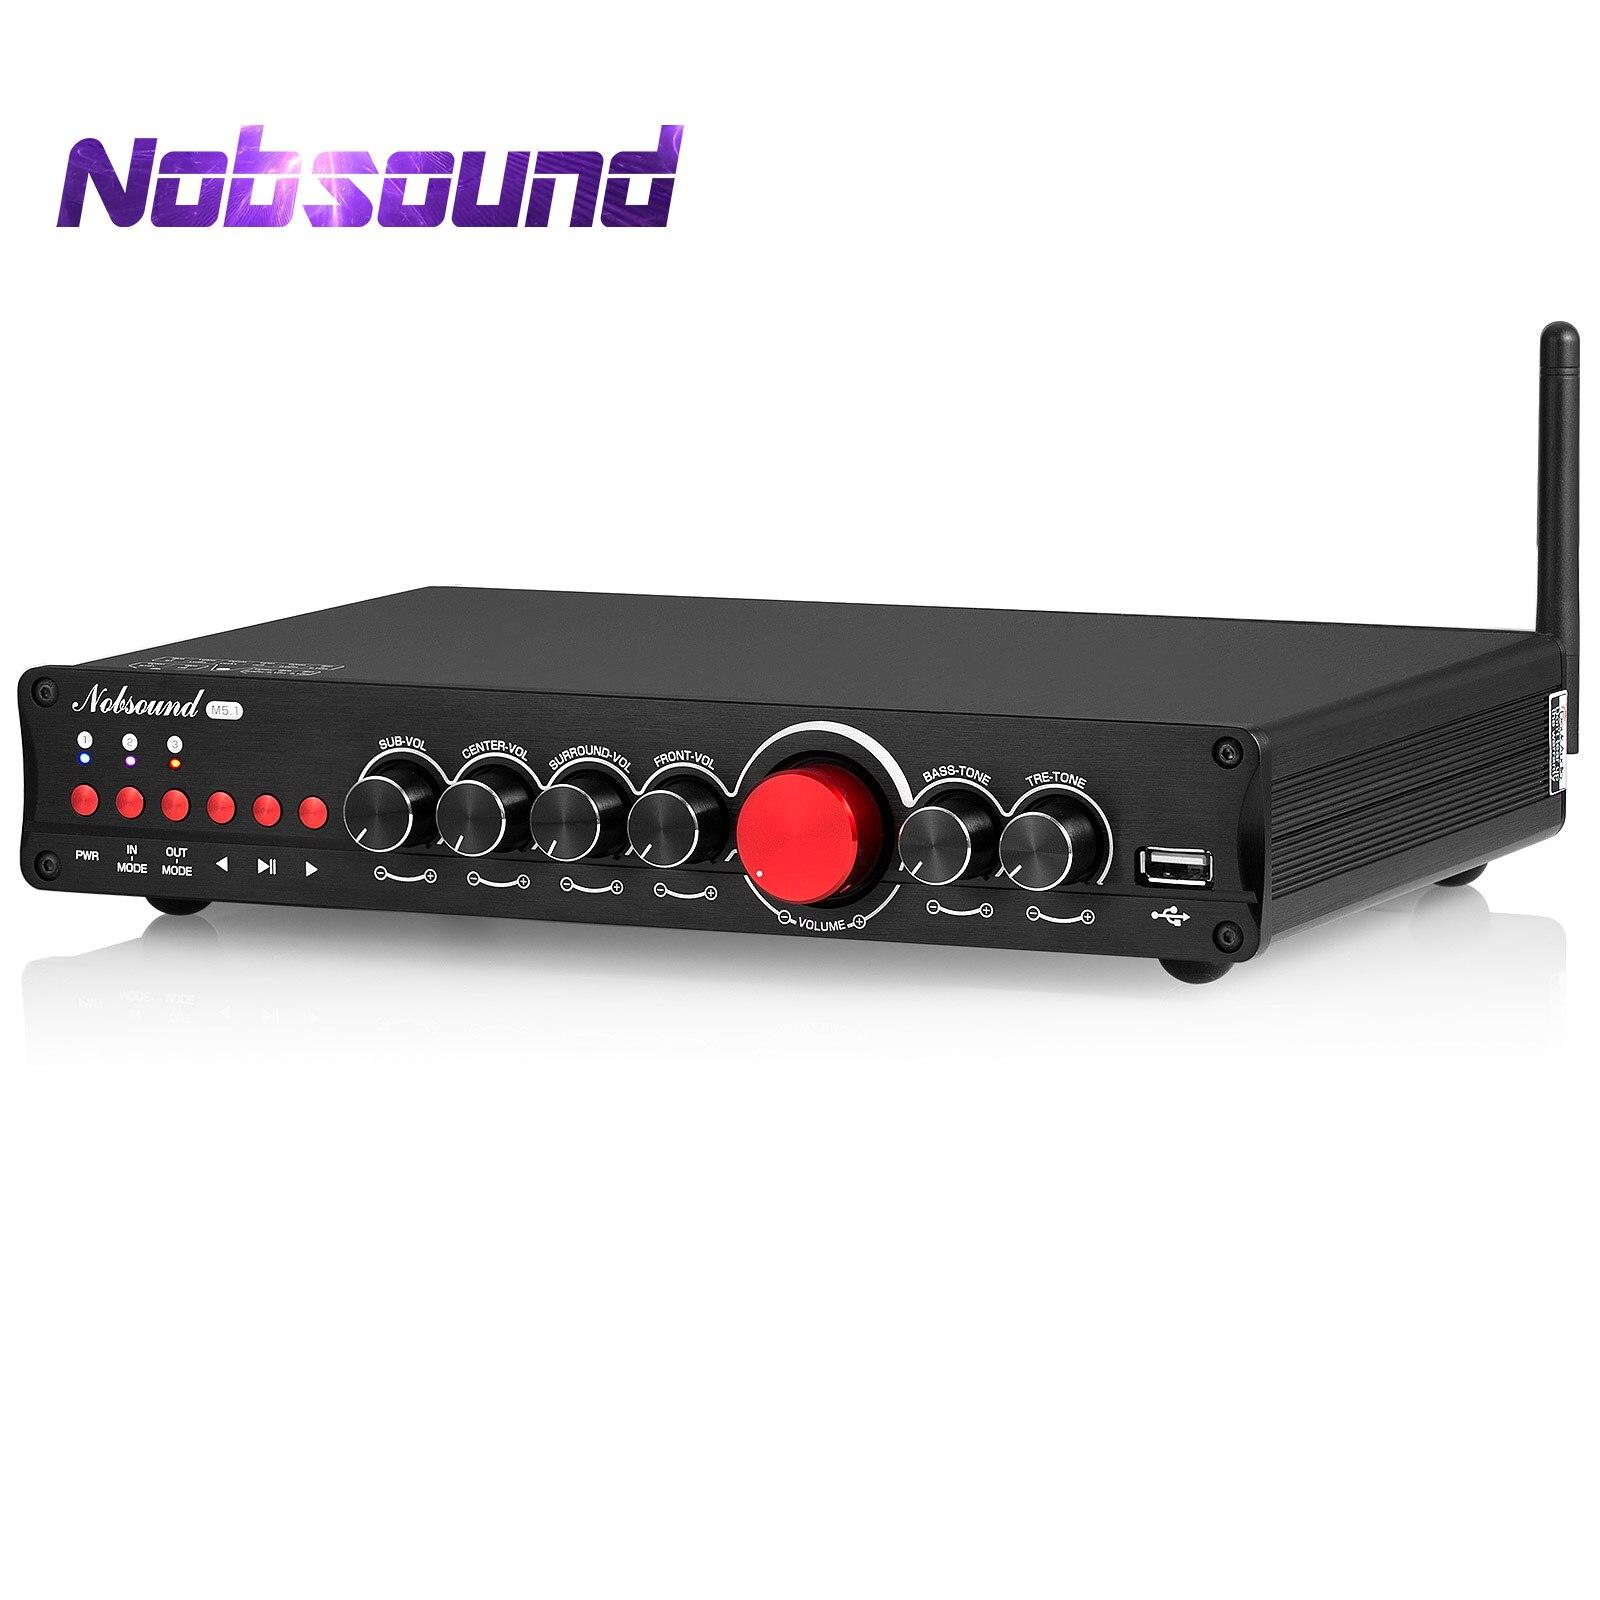 Nobsound HiFi 5.1 قناة بلوتوث مضخم رقمي اقناع/OPT المسرح المنزلي الصوت أمبير USB مشغل موسيقى باس أمبير APTX-HD